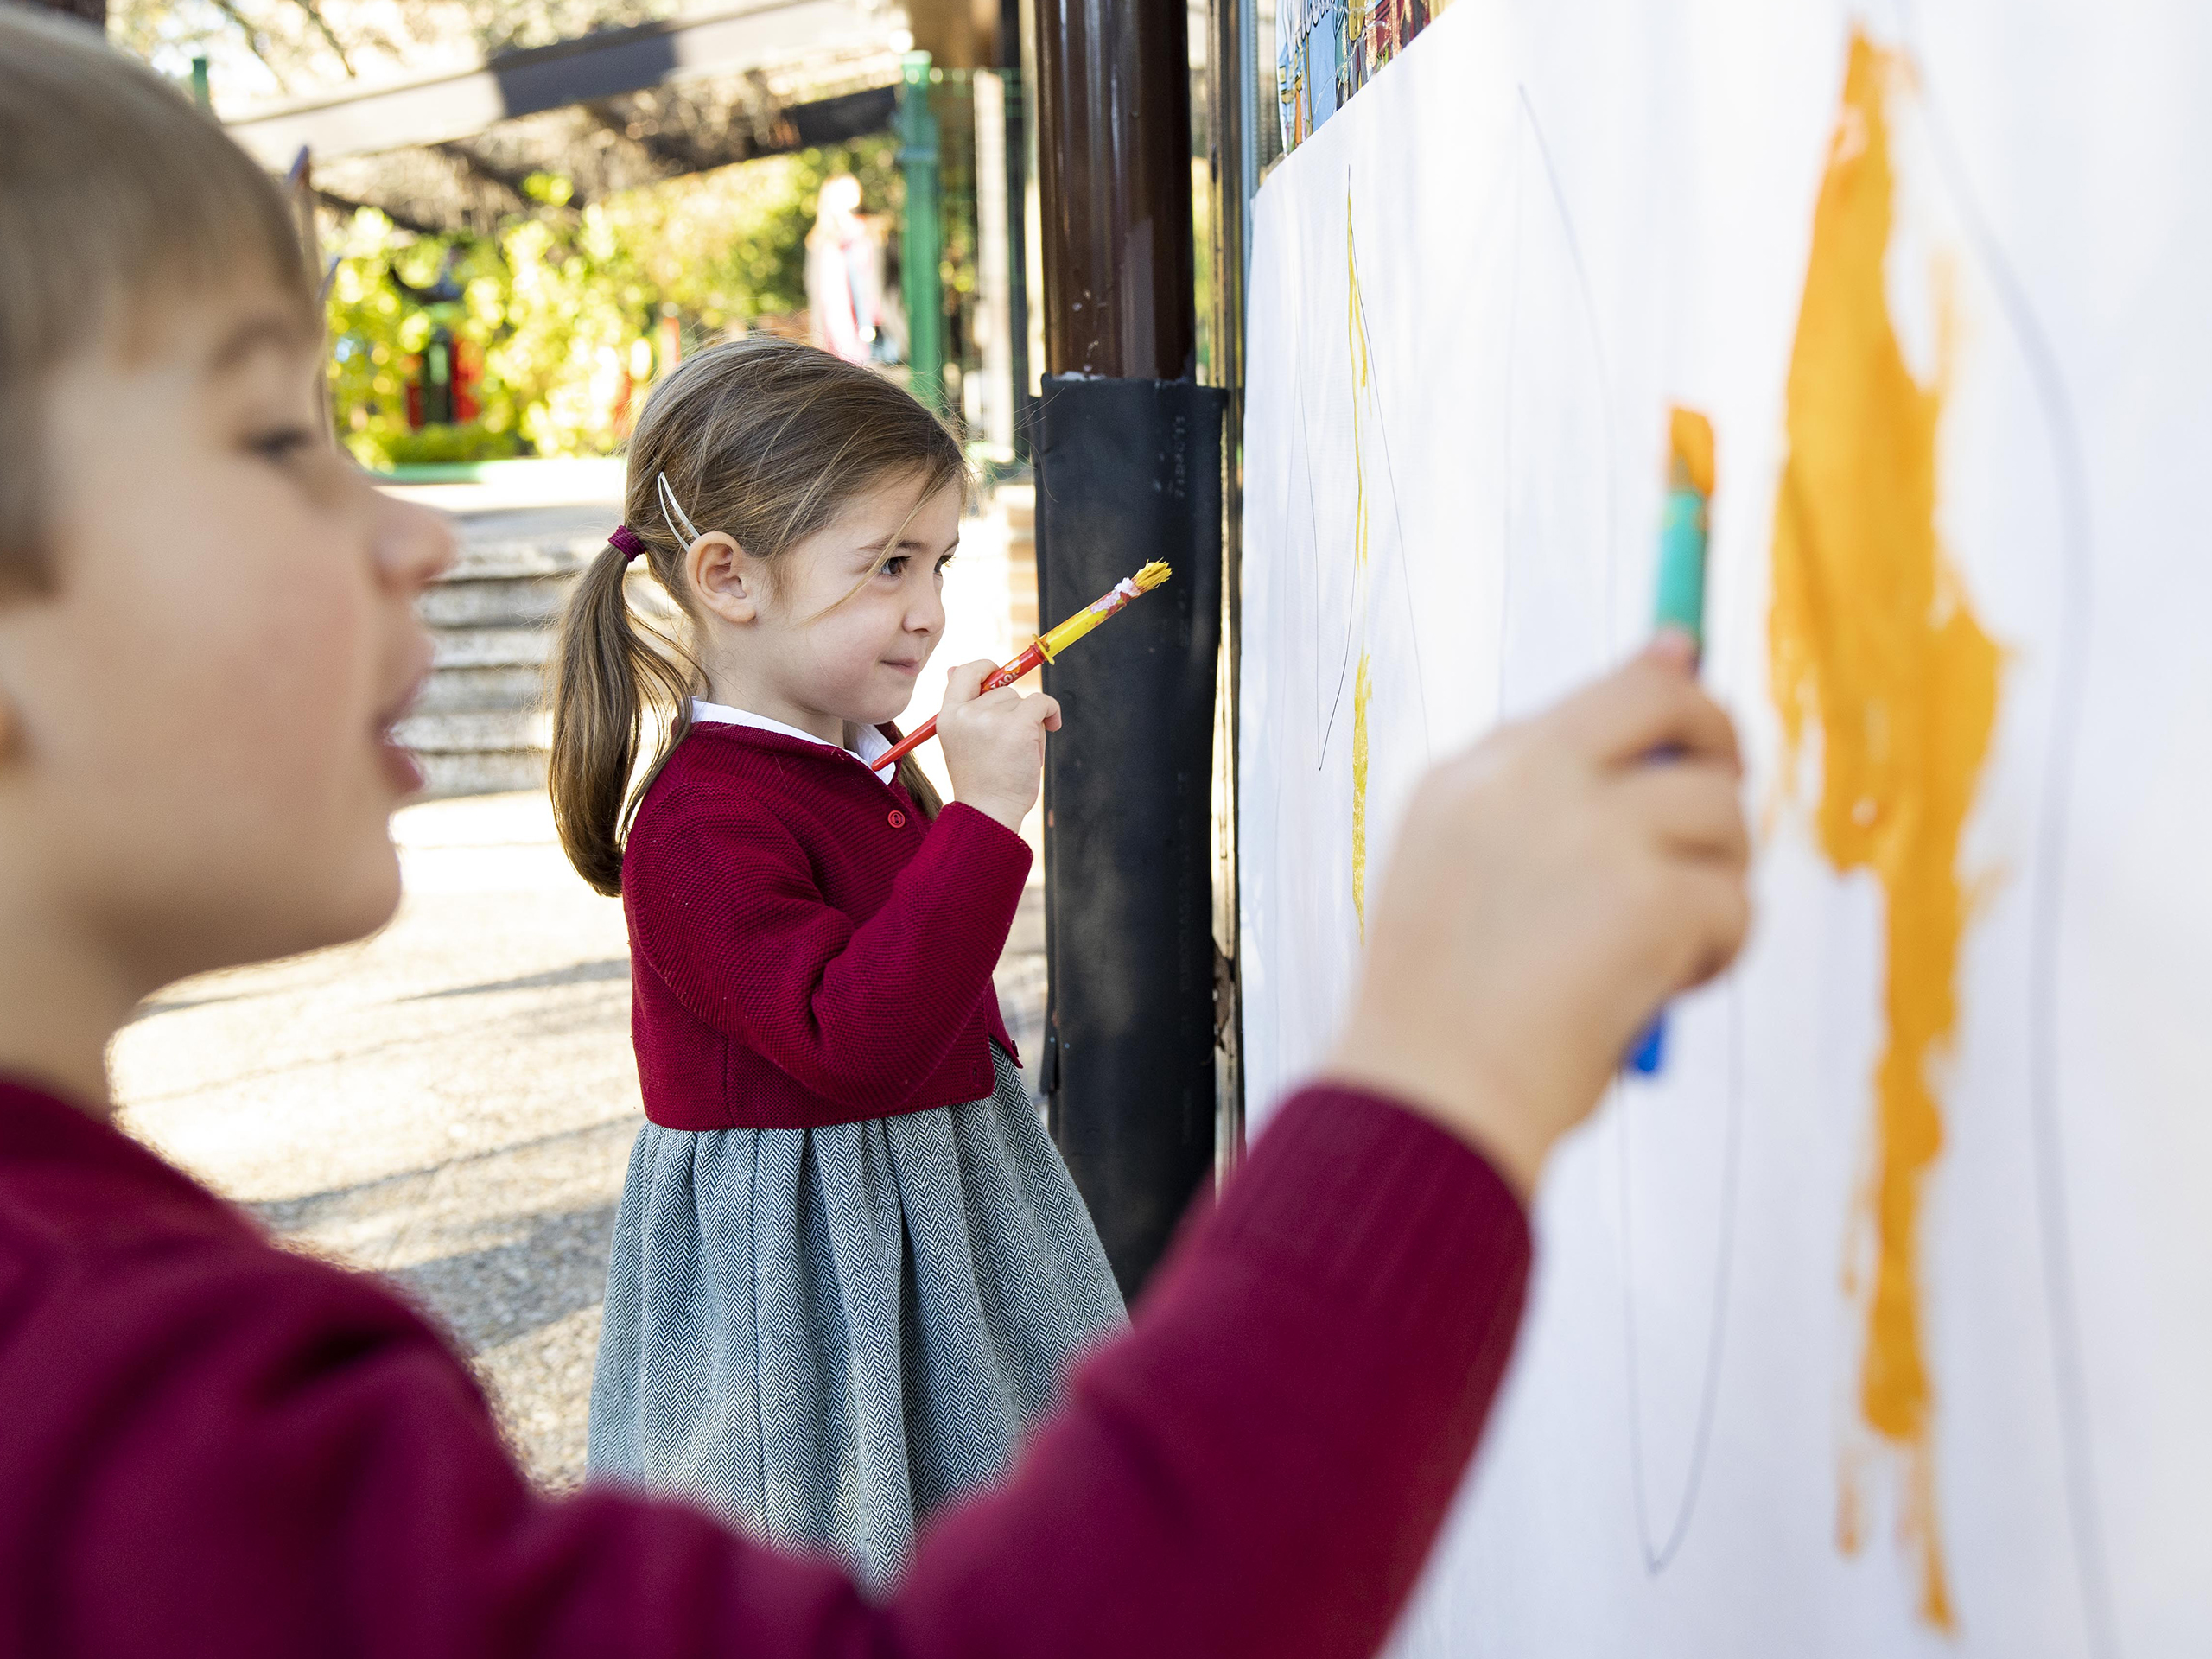 infantil-dallignton-school-2